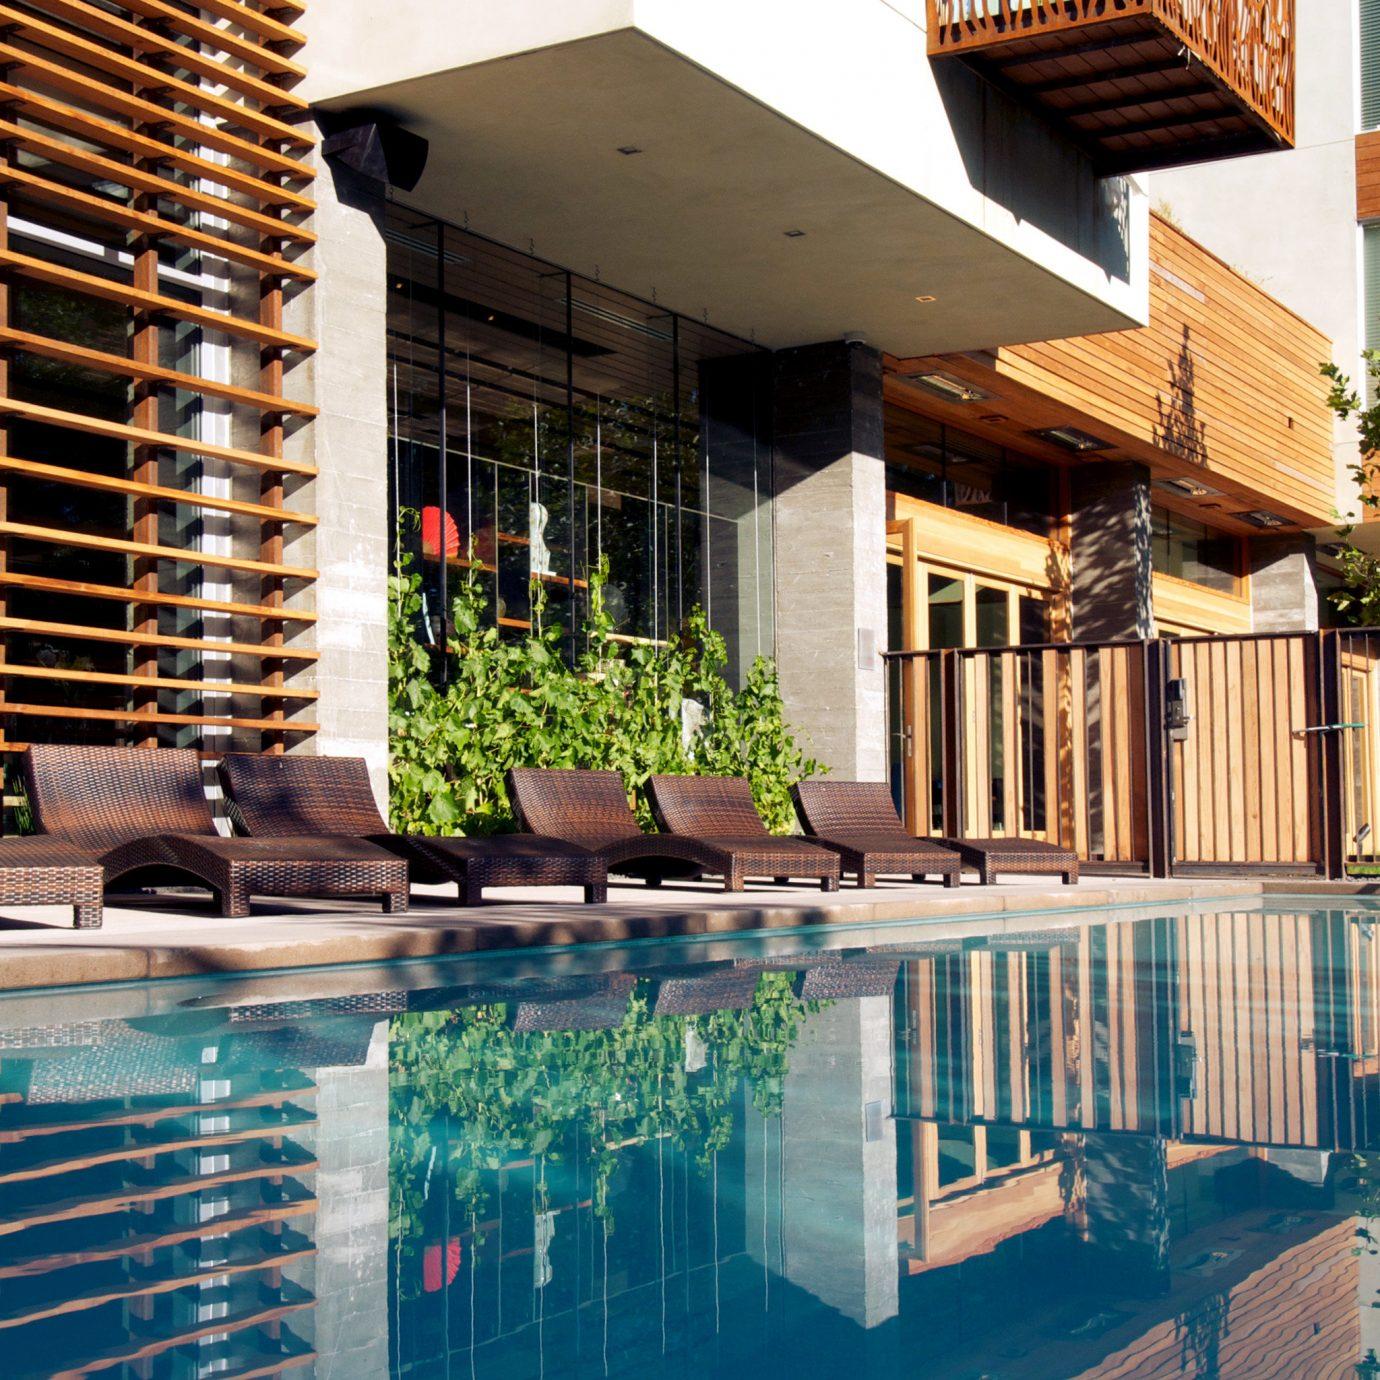 Hip Lounge Modern Patio Pool Terrace building swimming pool leisure property house condominium Architecture Resort home backyard Villa